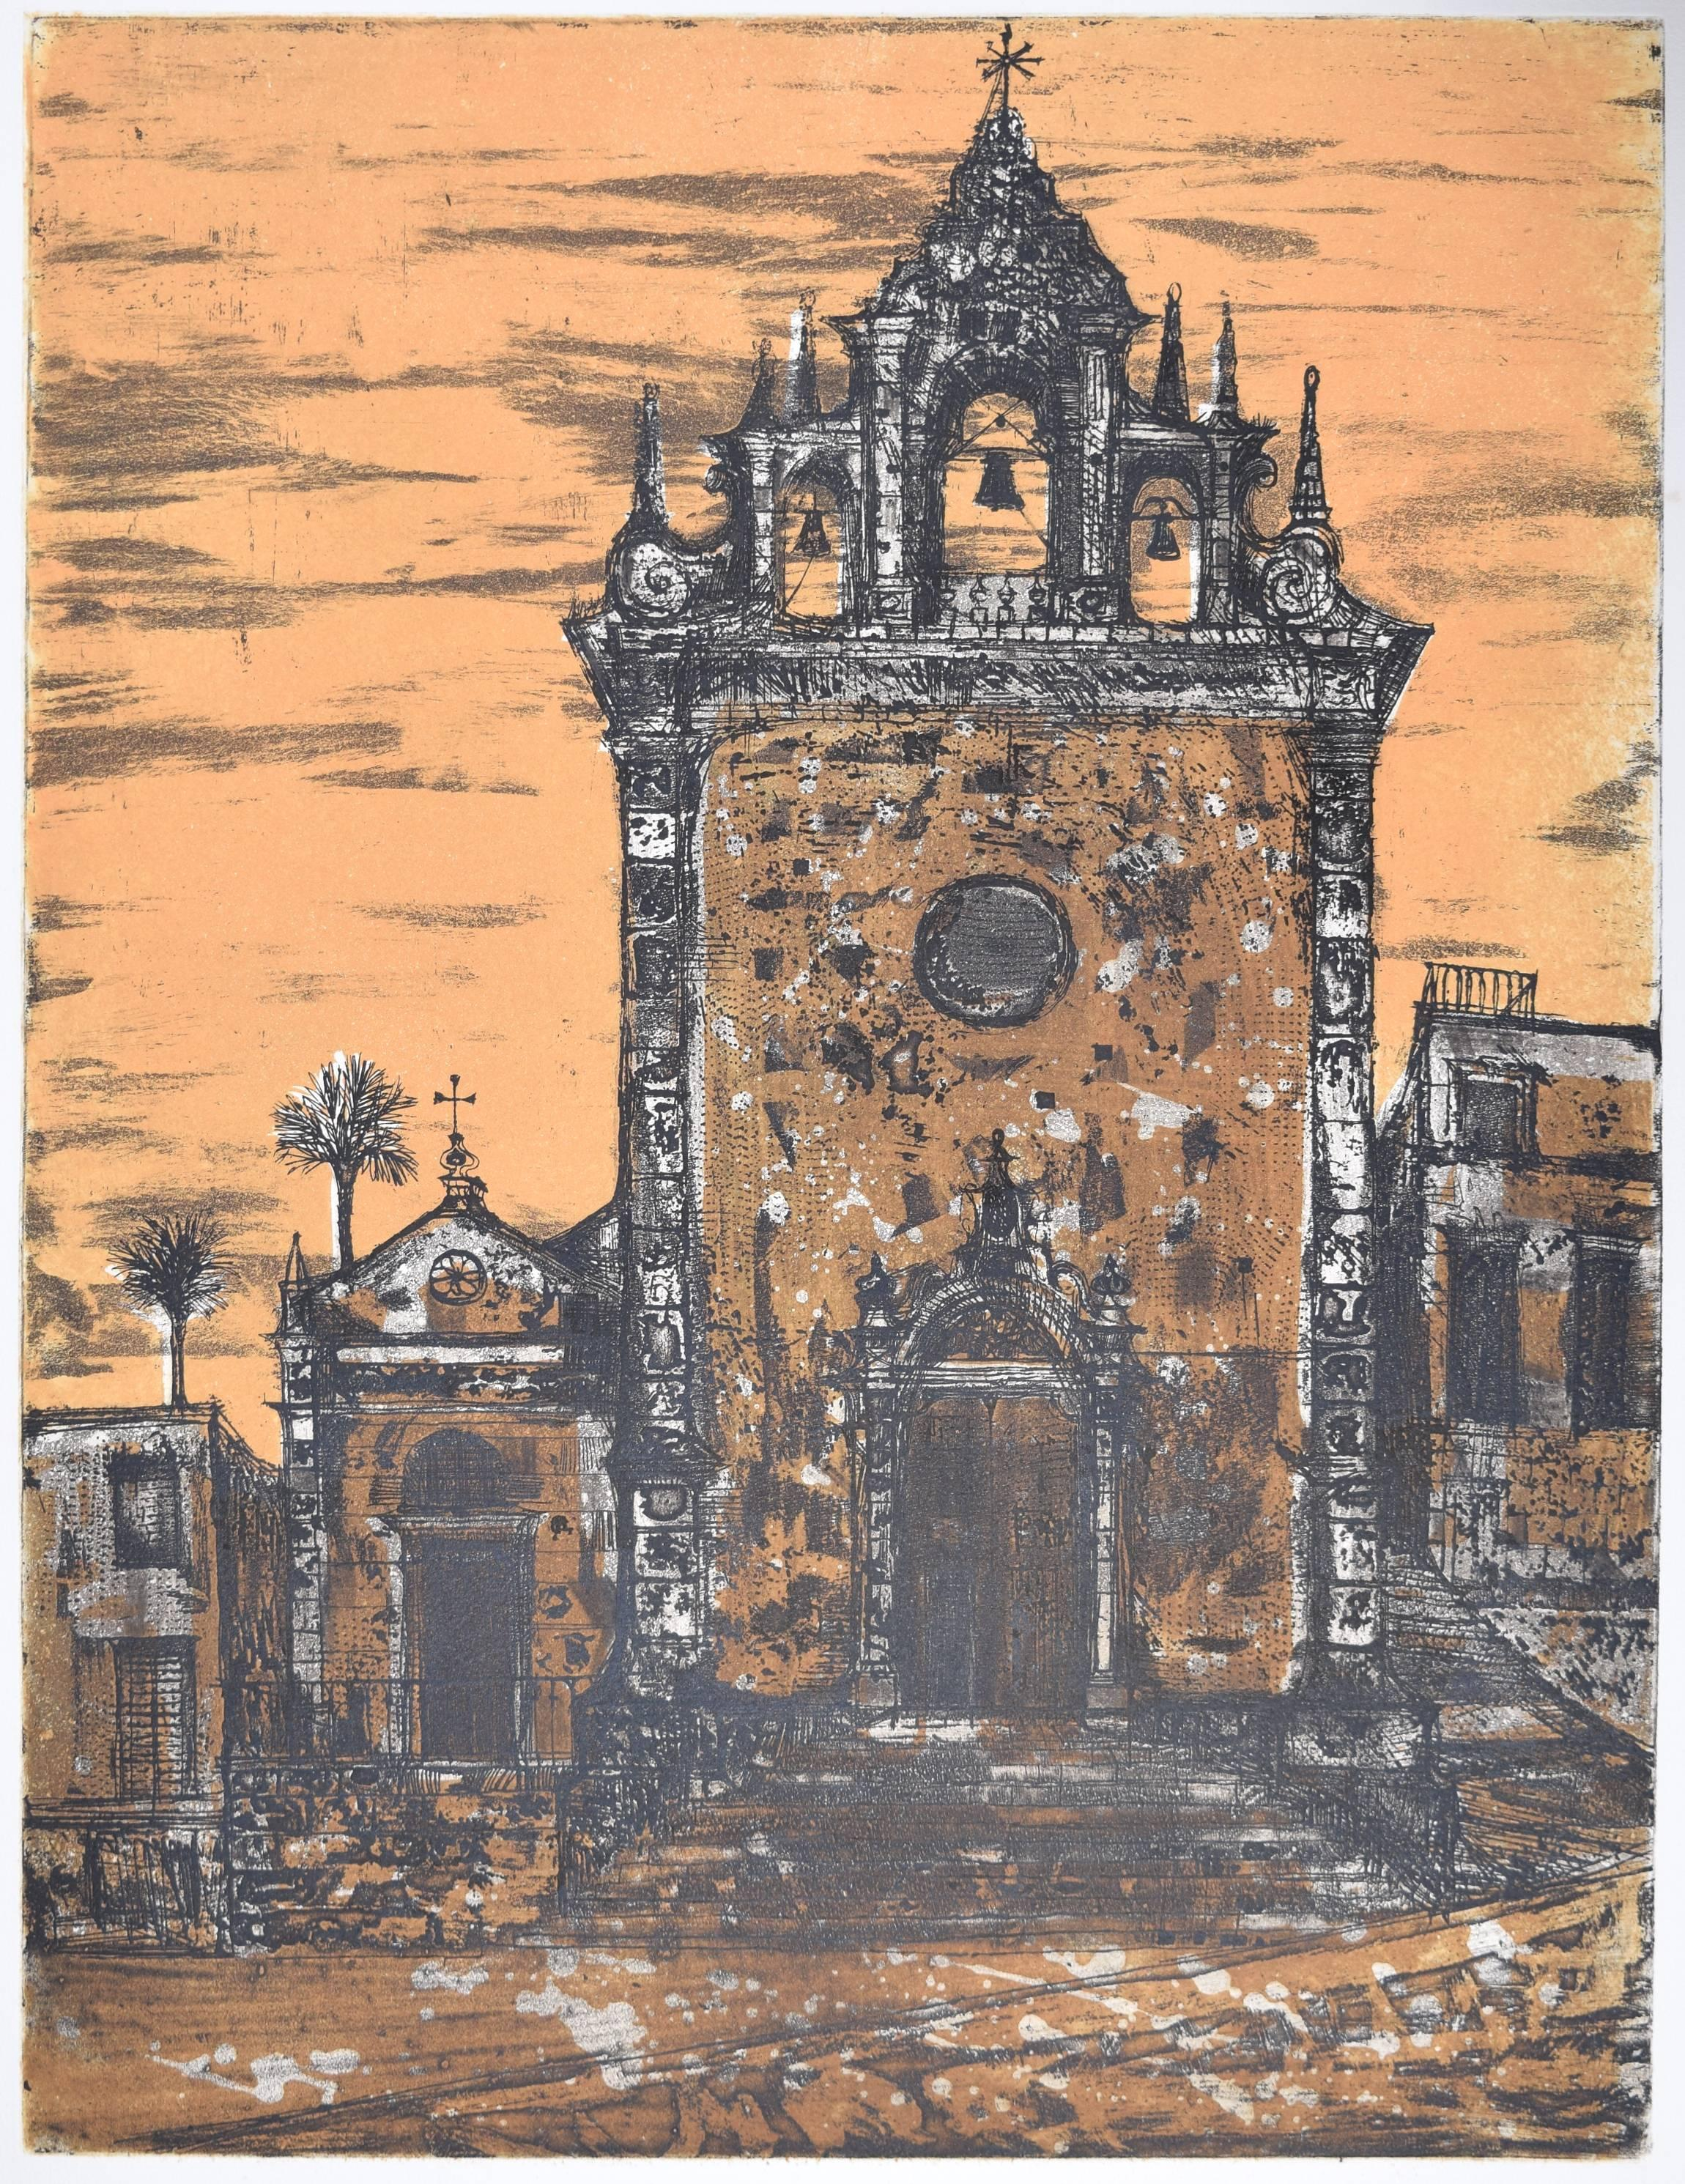 Richard Beer Piazza Armerina II etching and aquatint (pink version)